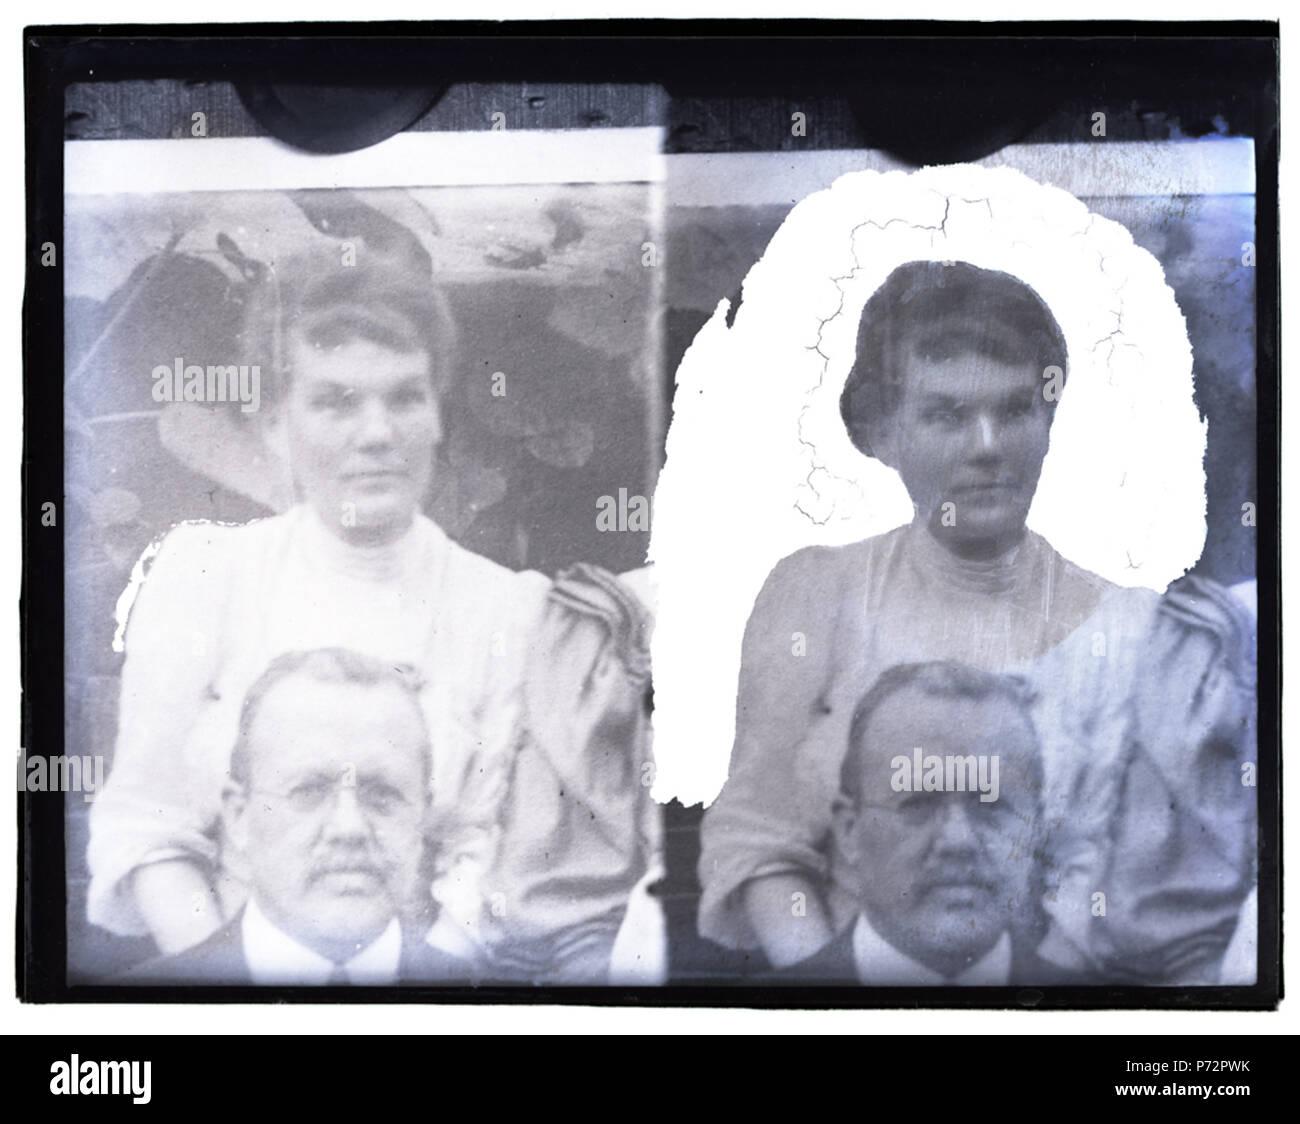 Englisch: DKW Girling L 34096 1. Diese Medien Upload Datum: 7. April 2015, 12:12:59 Originale vor 1944 18 Girling, Kopie Foto, 18. Feb 1915 (17065202431) Stockbild